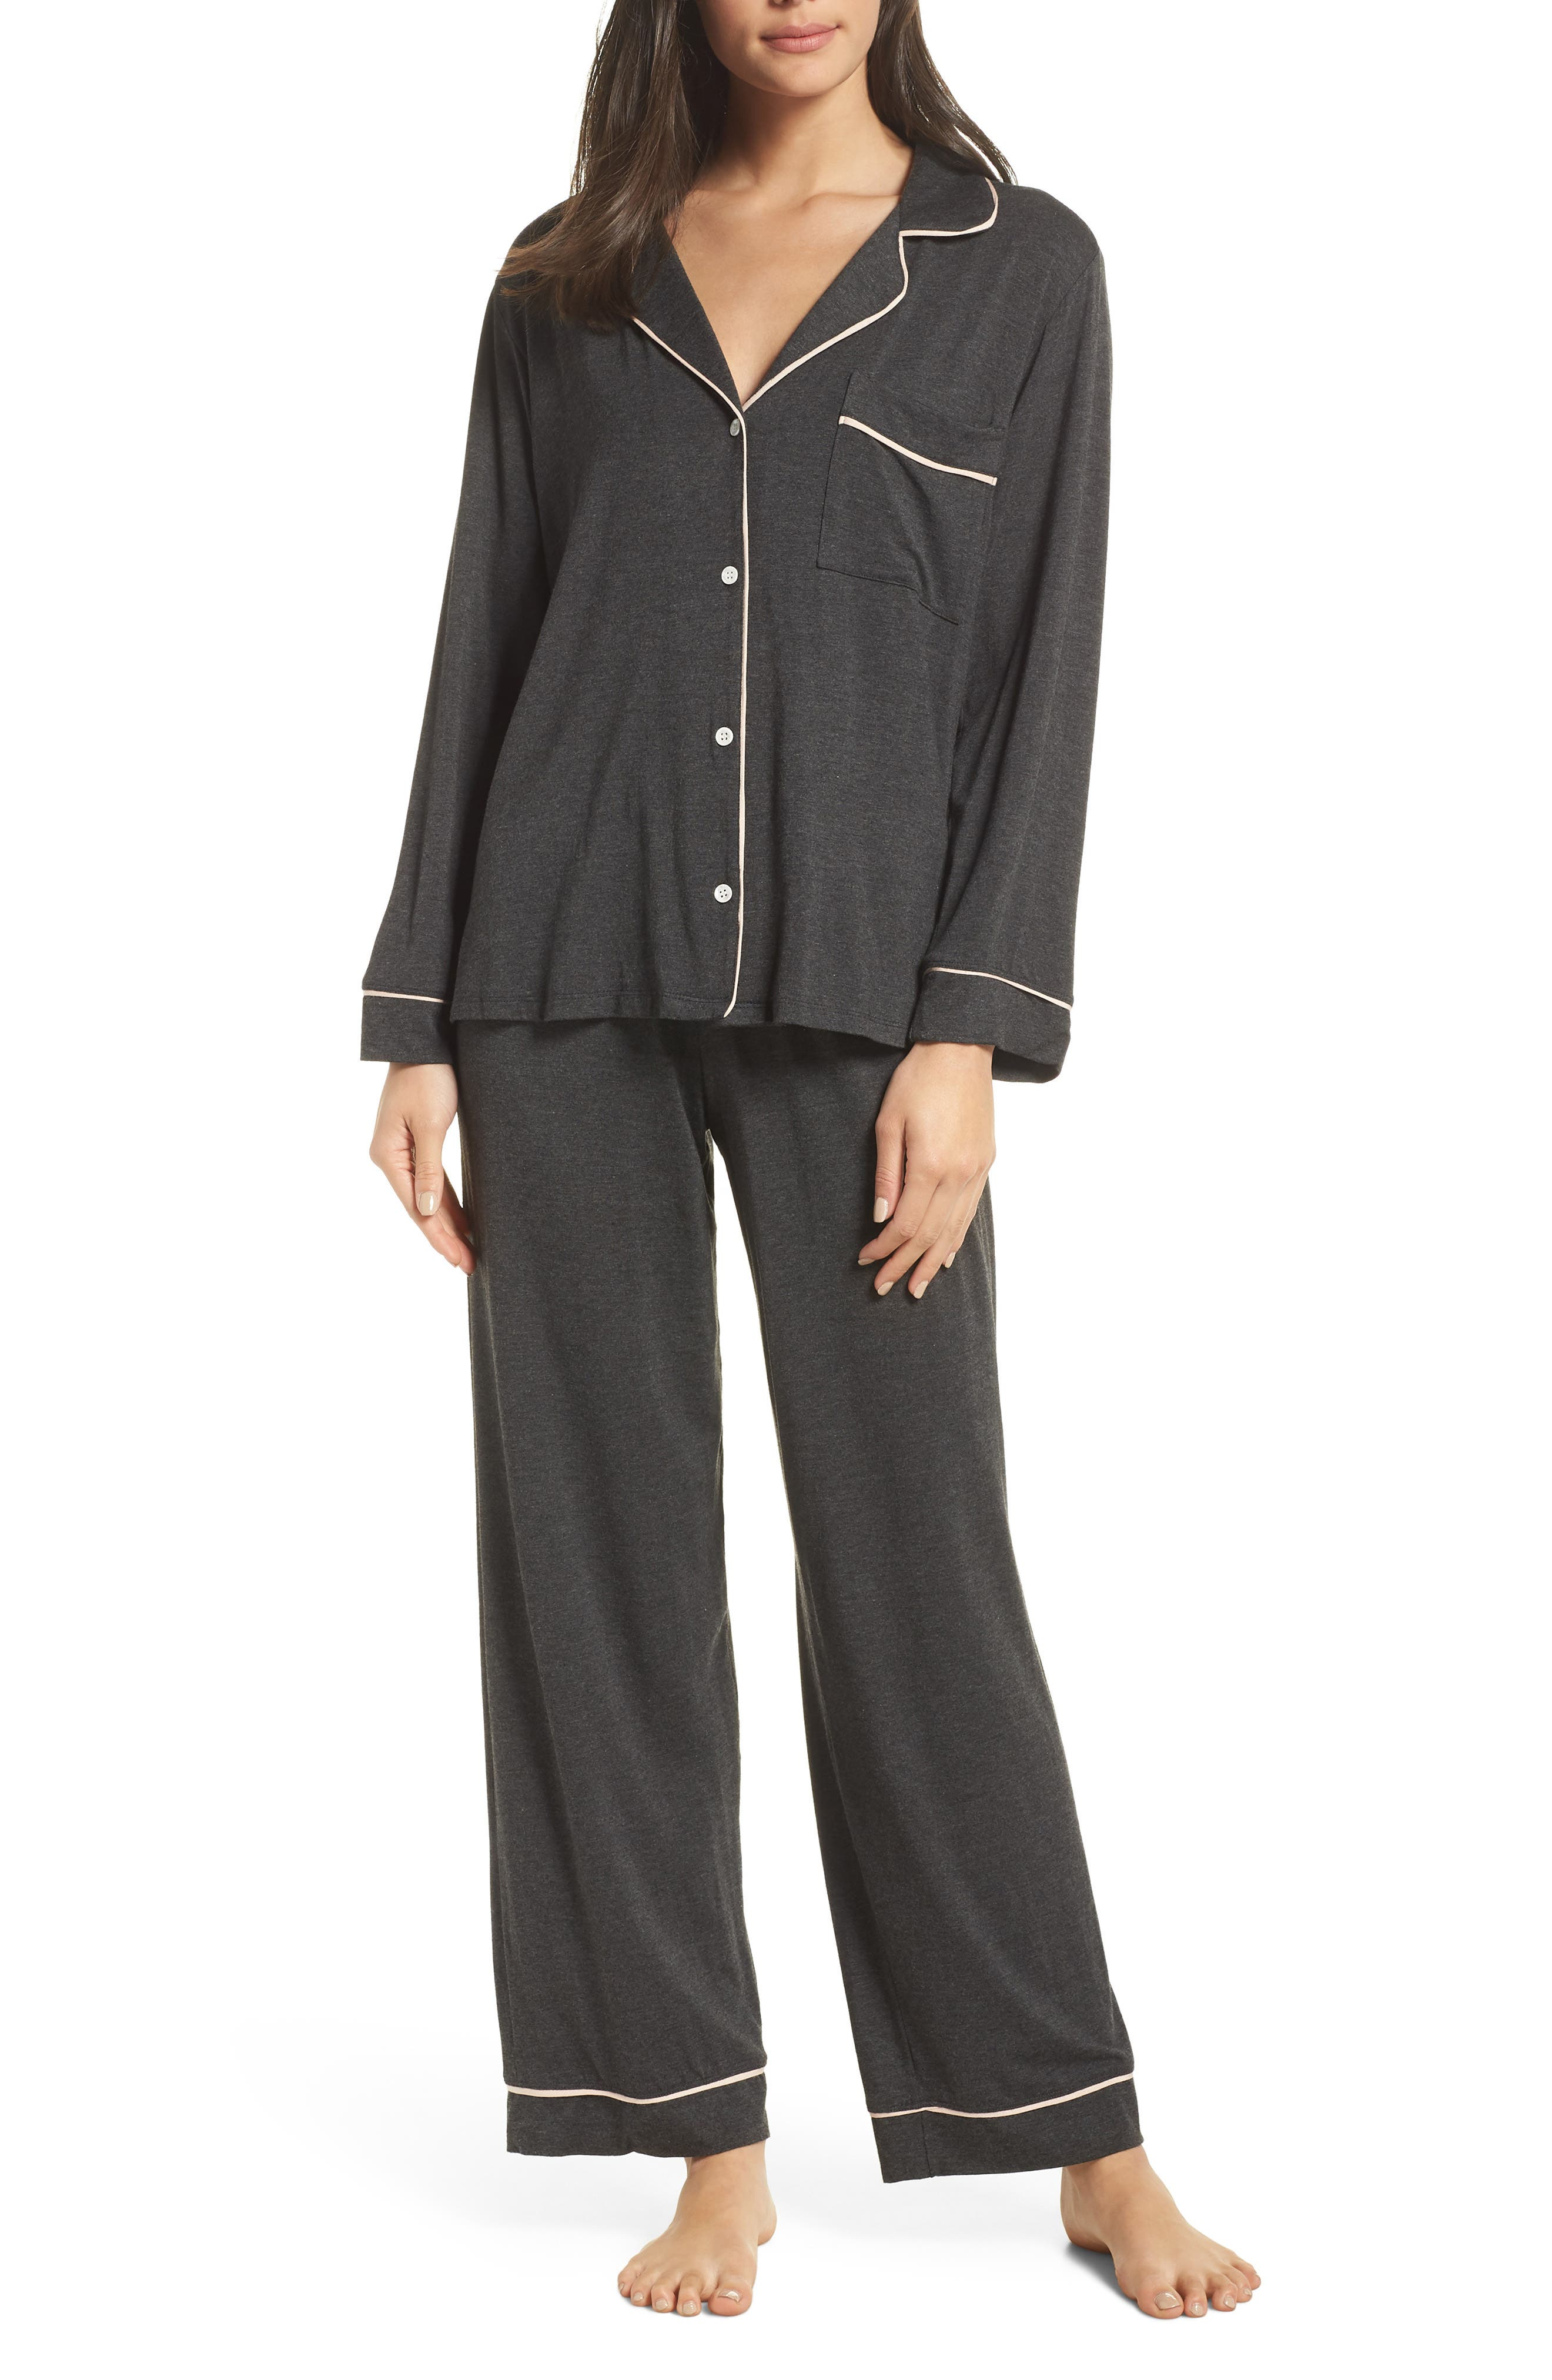 Gisele Pajamas,                         Main,                         color, CHARCOAL/ BELLINI